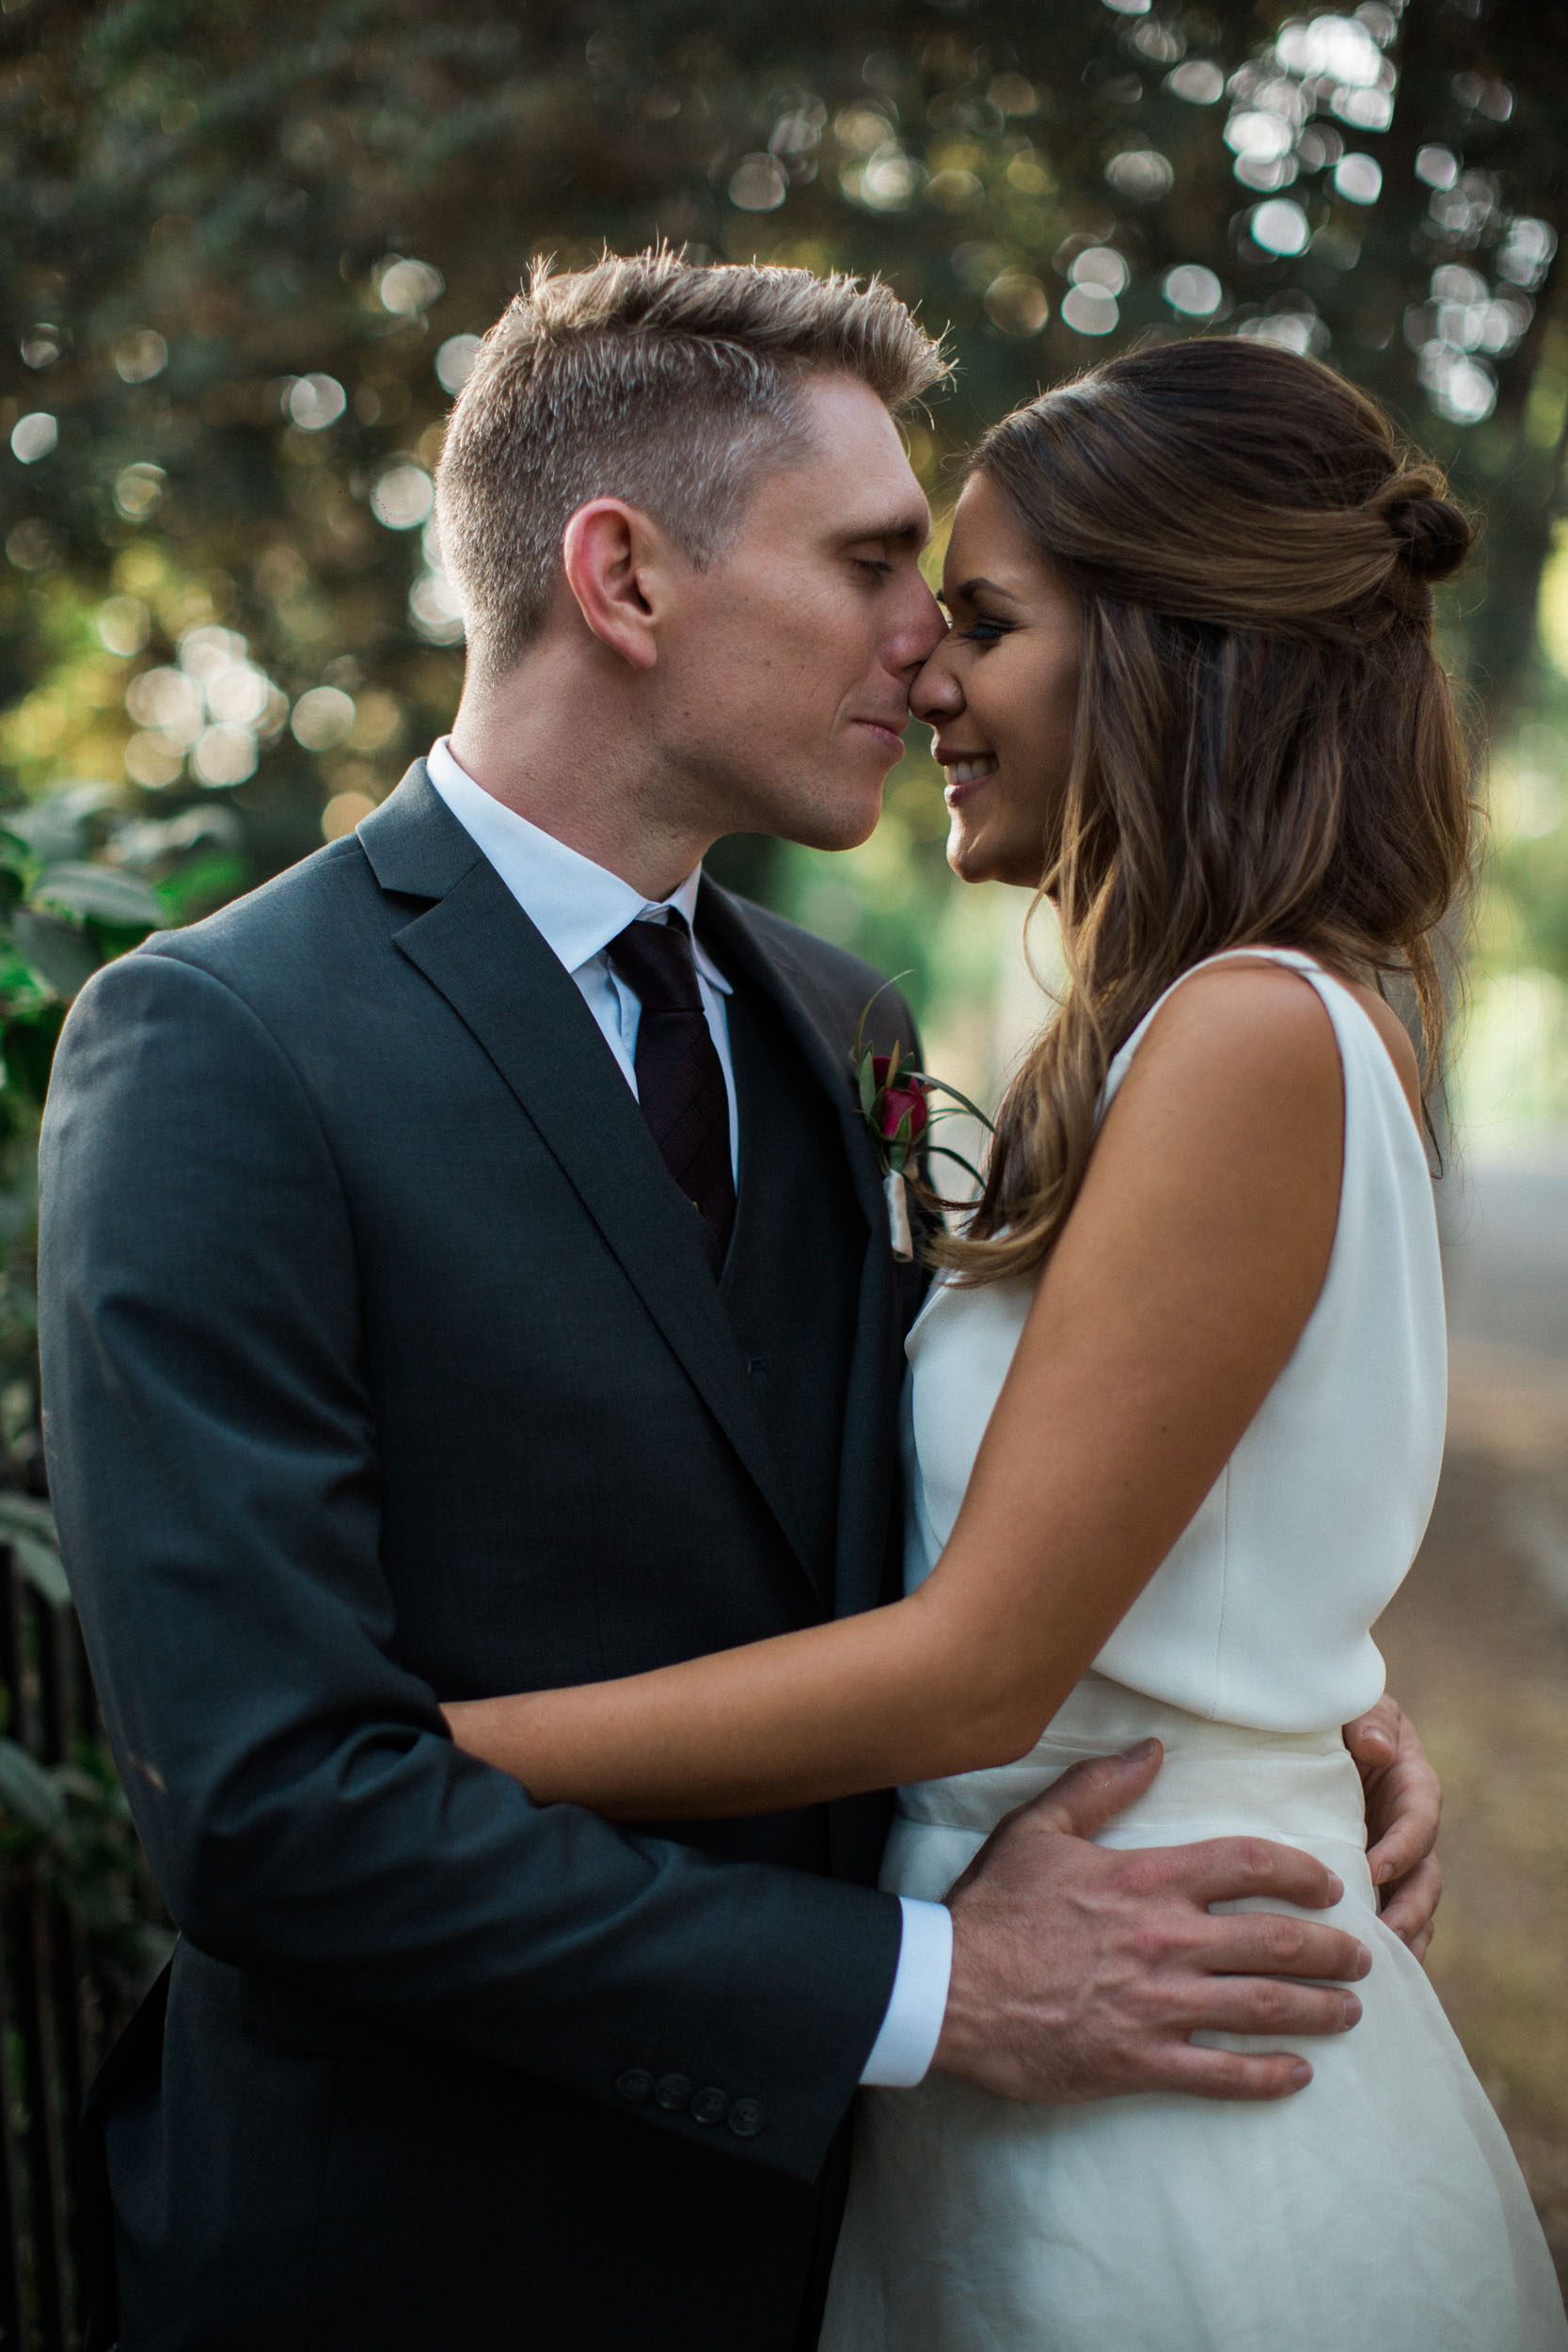 BKM-Photography-Highland-Park-Los-Angeles-Backyard-Wedding-0041.jpg